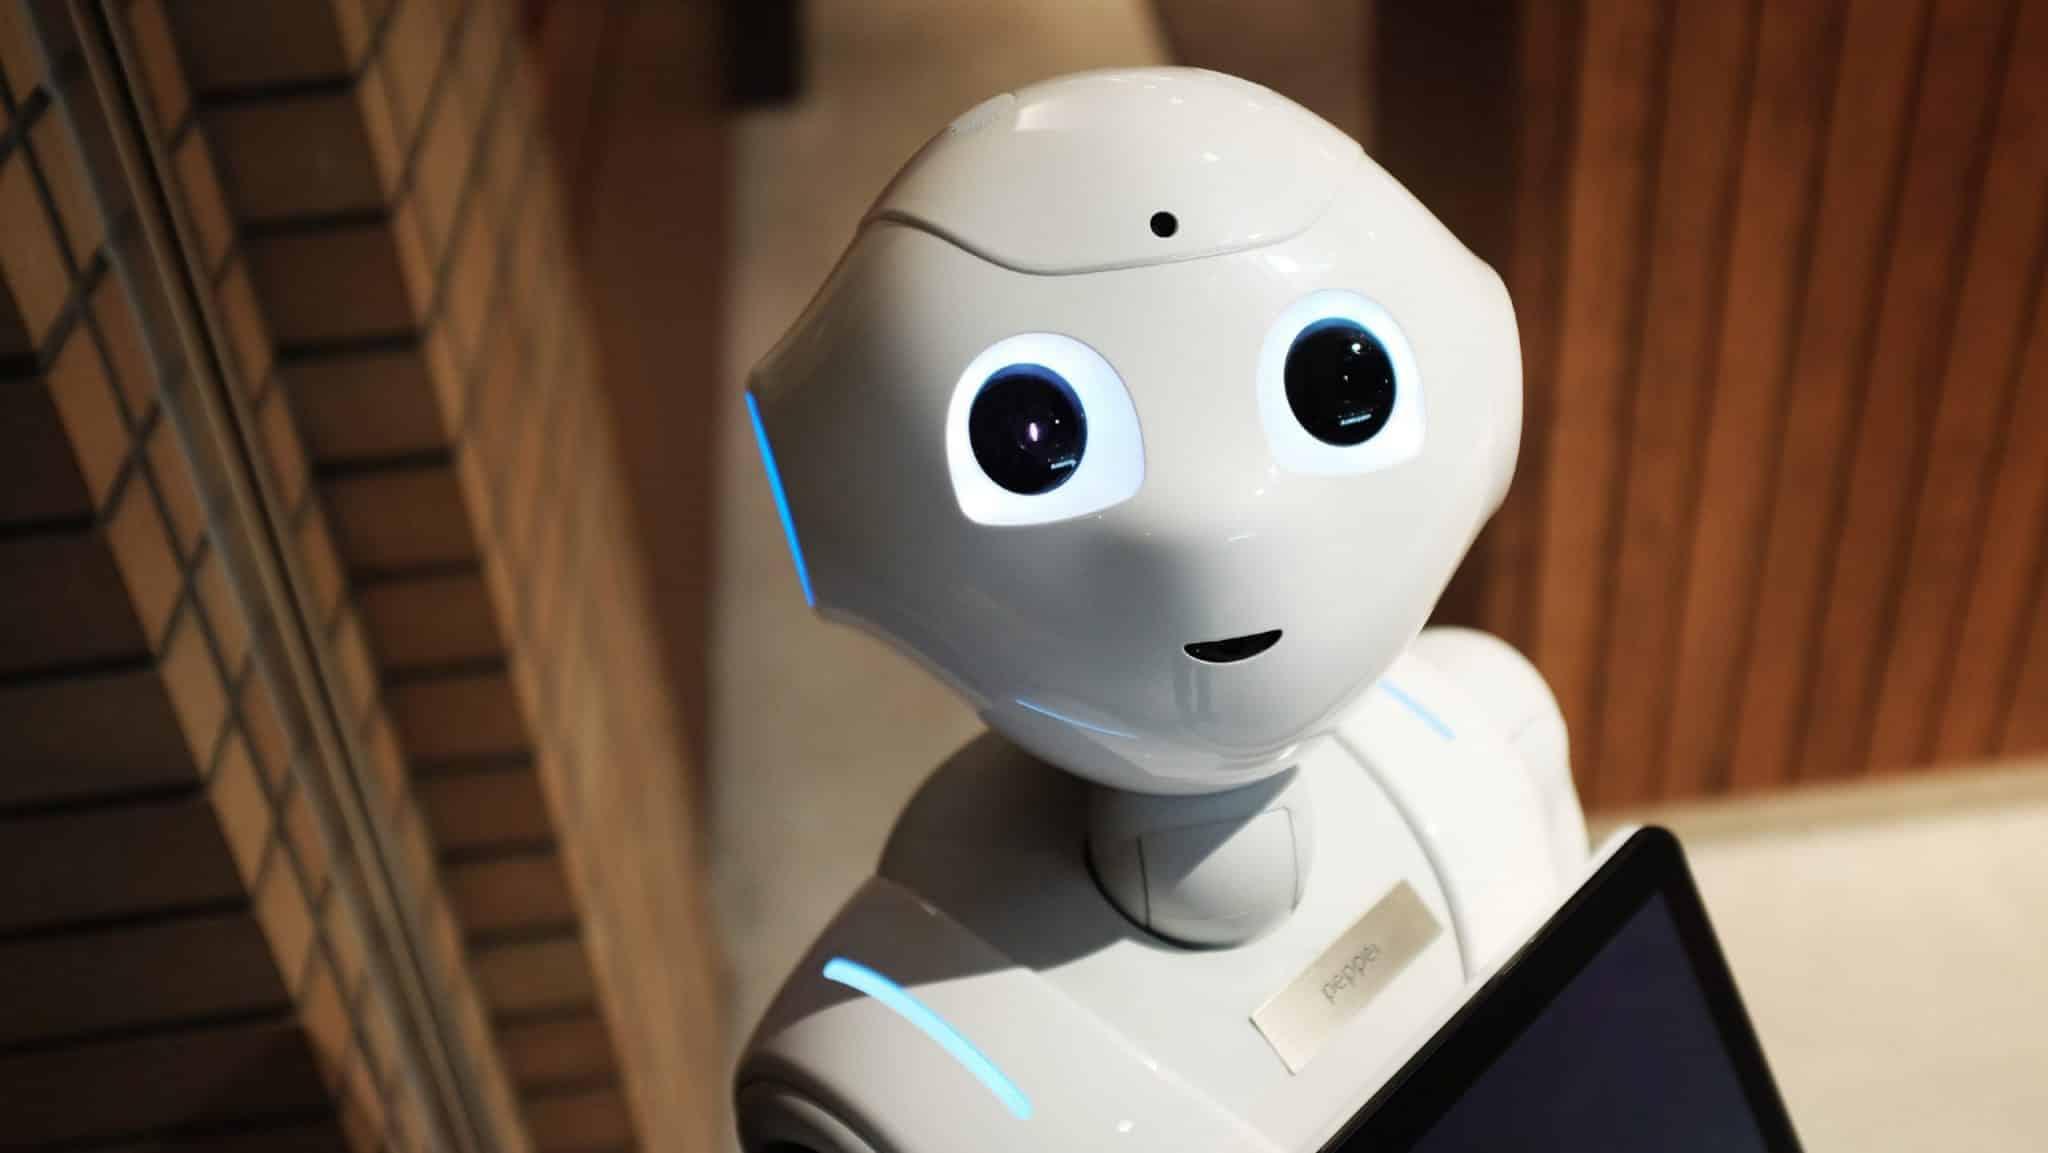 umela inteligencia robot